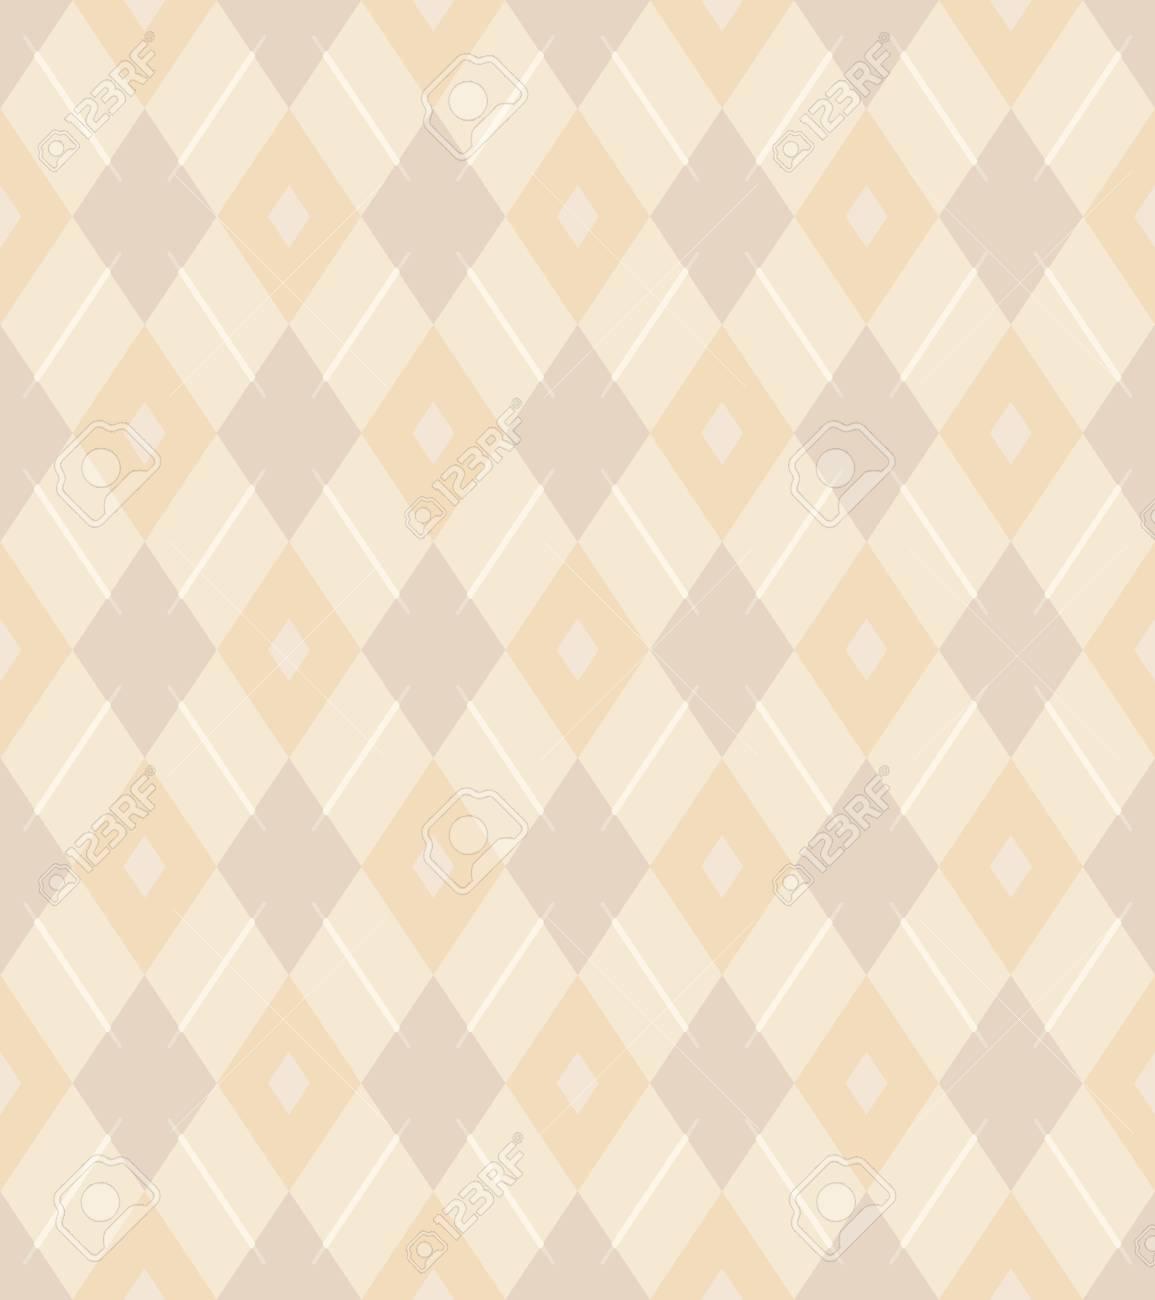 Elegant Seamless Victorian Wallpaper Background Rhomb Check Cross